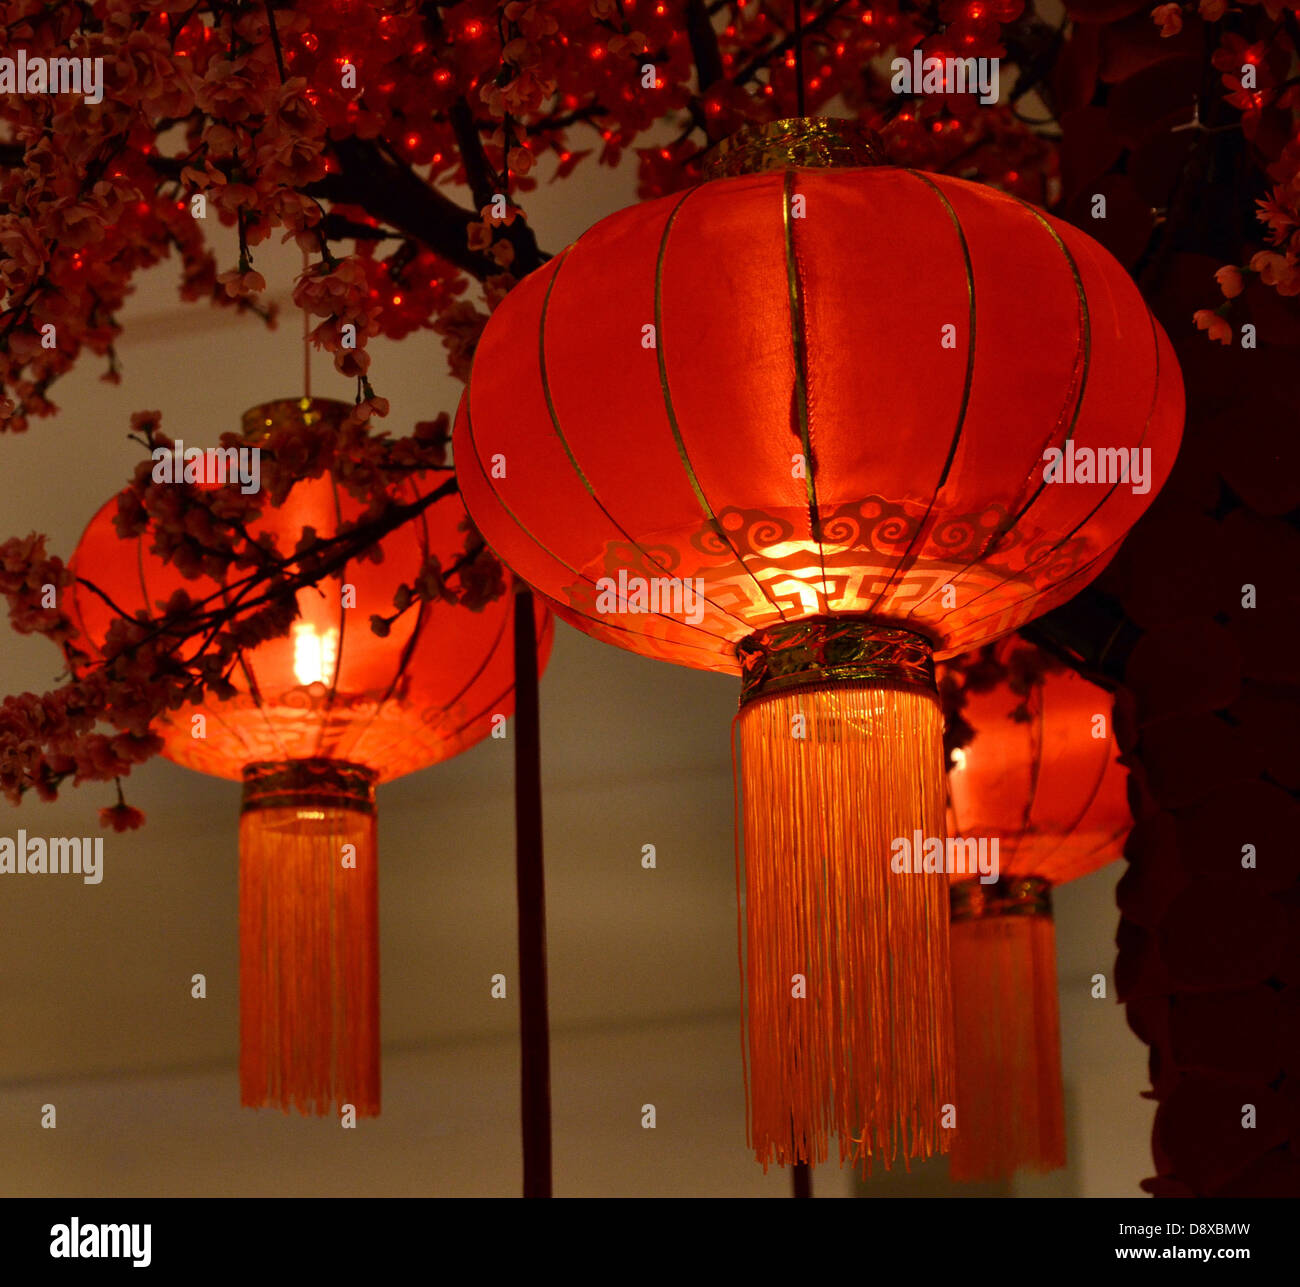 Rote Laterne chinesische Kultur Asiens Stockbild